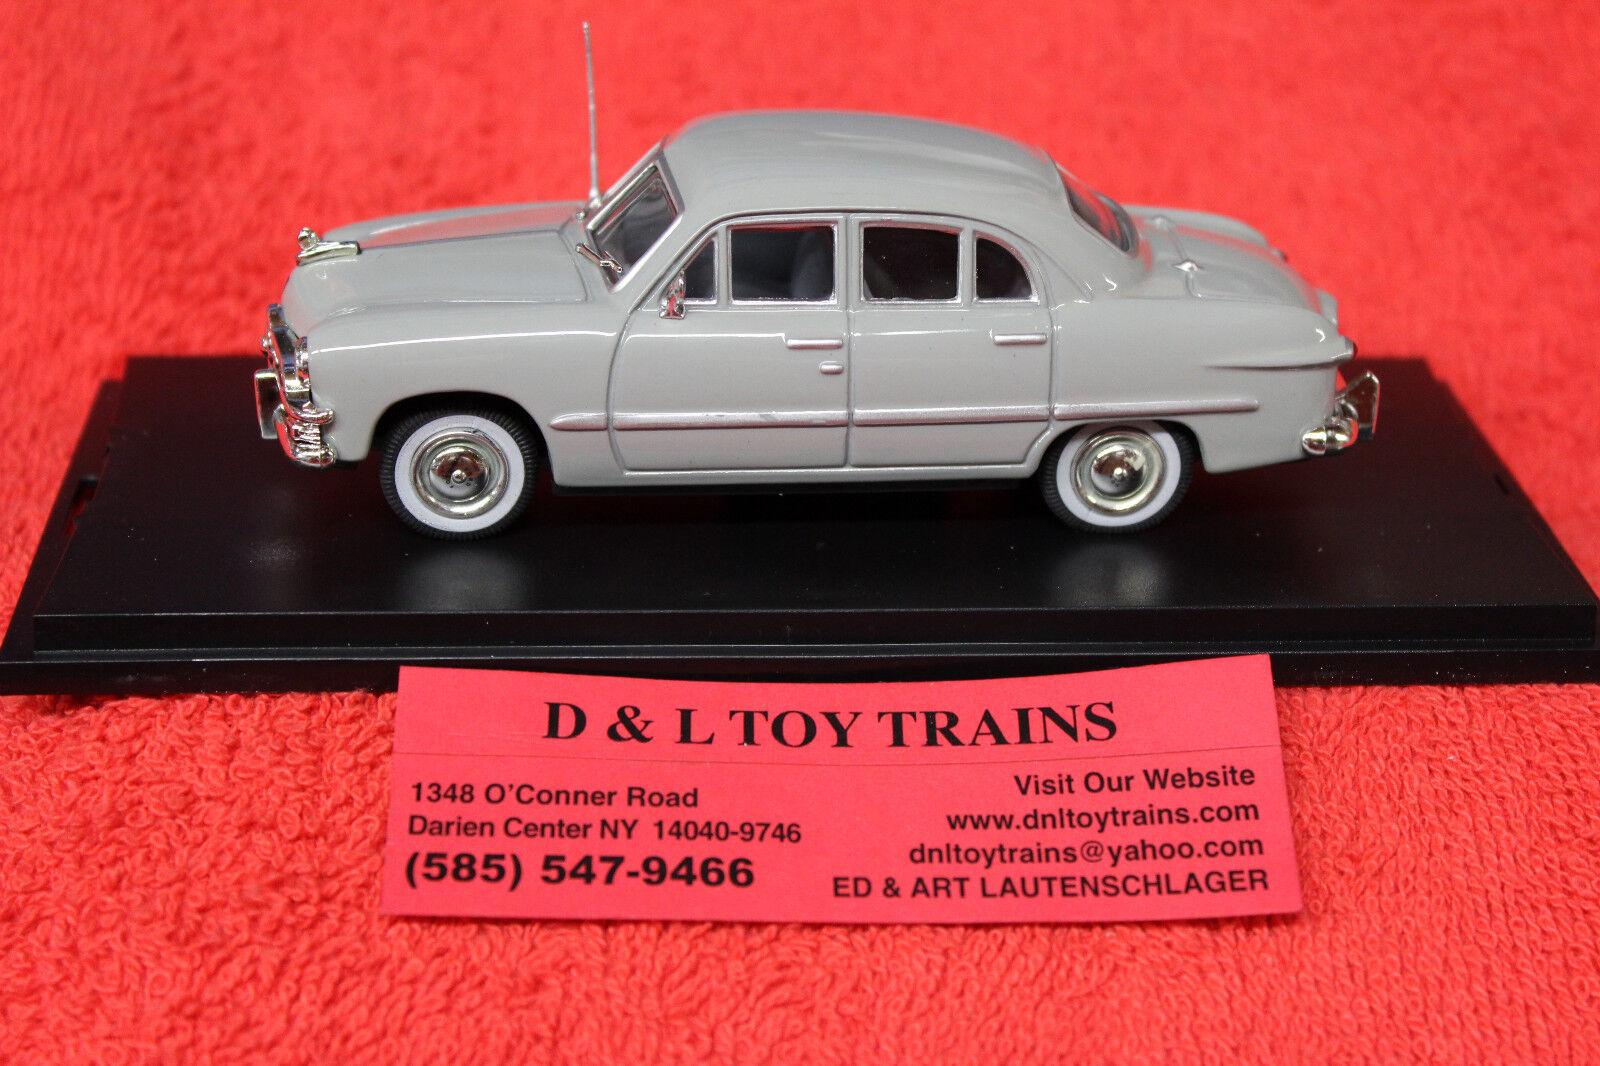 43-306 1950 1950 1950 Ford 4 Door Sedan NEW IN BOX b5689a